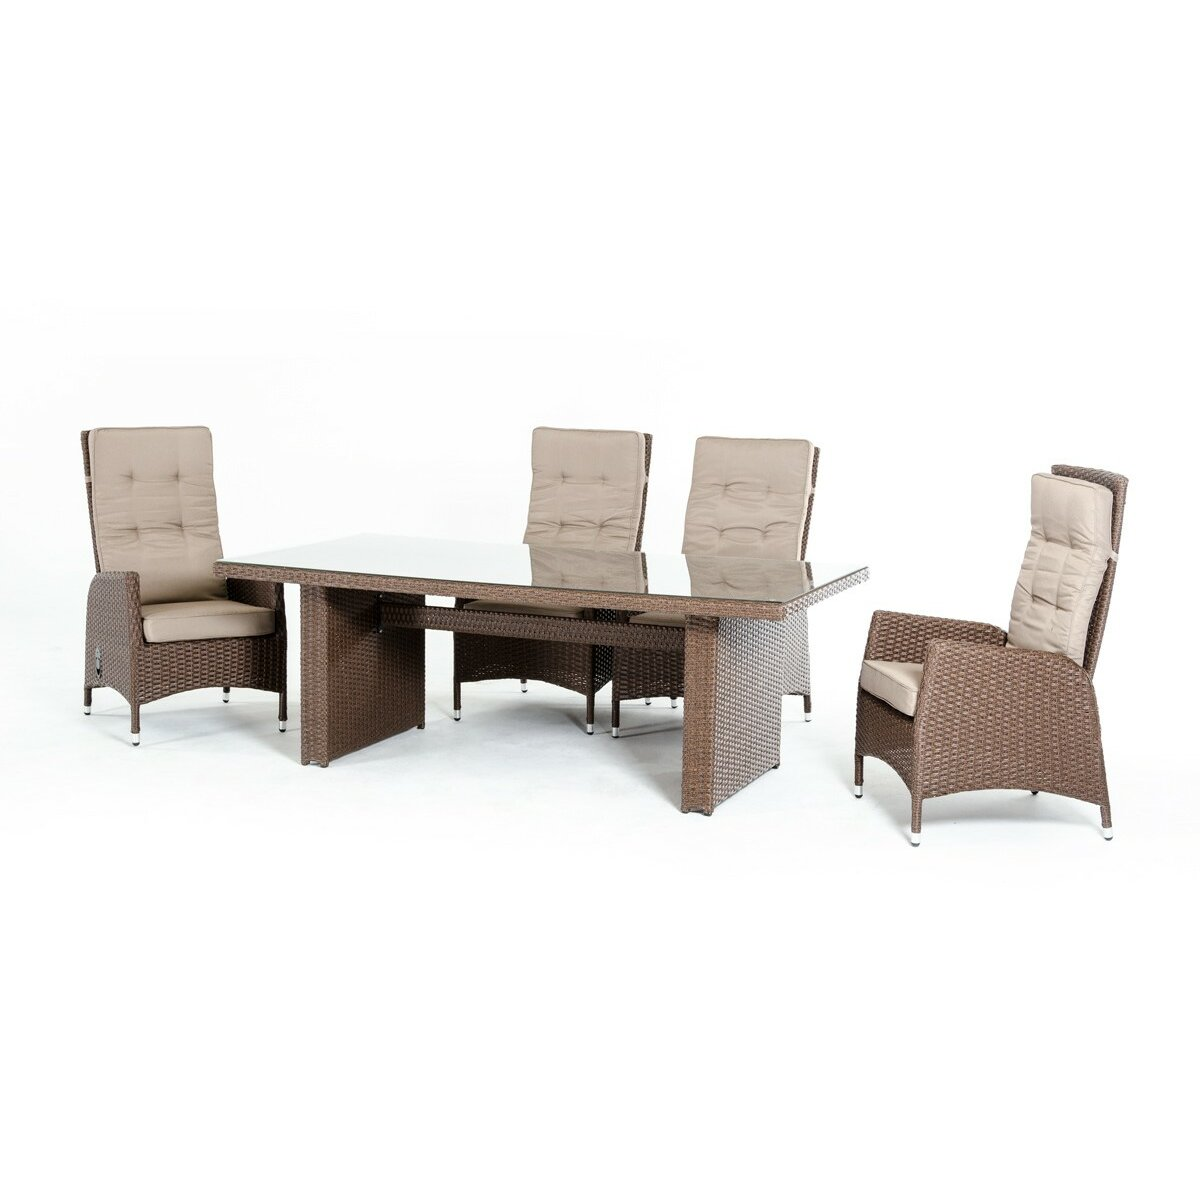 Ashley Furniture Toledo: VIG Furniture Renava Toledo 7 Piece Dining Set With